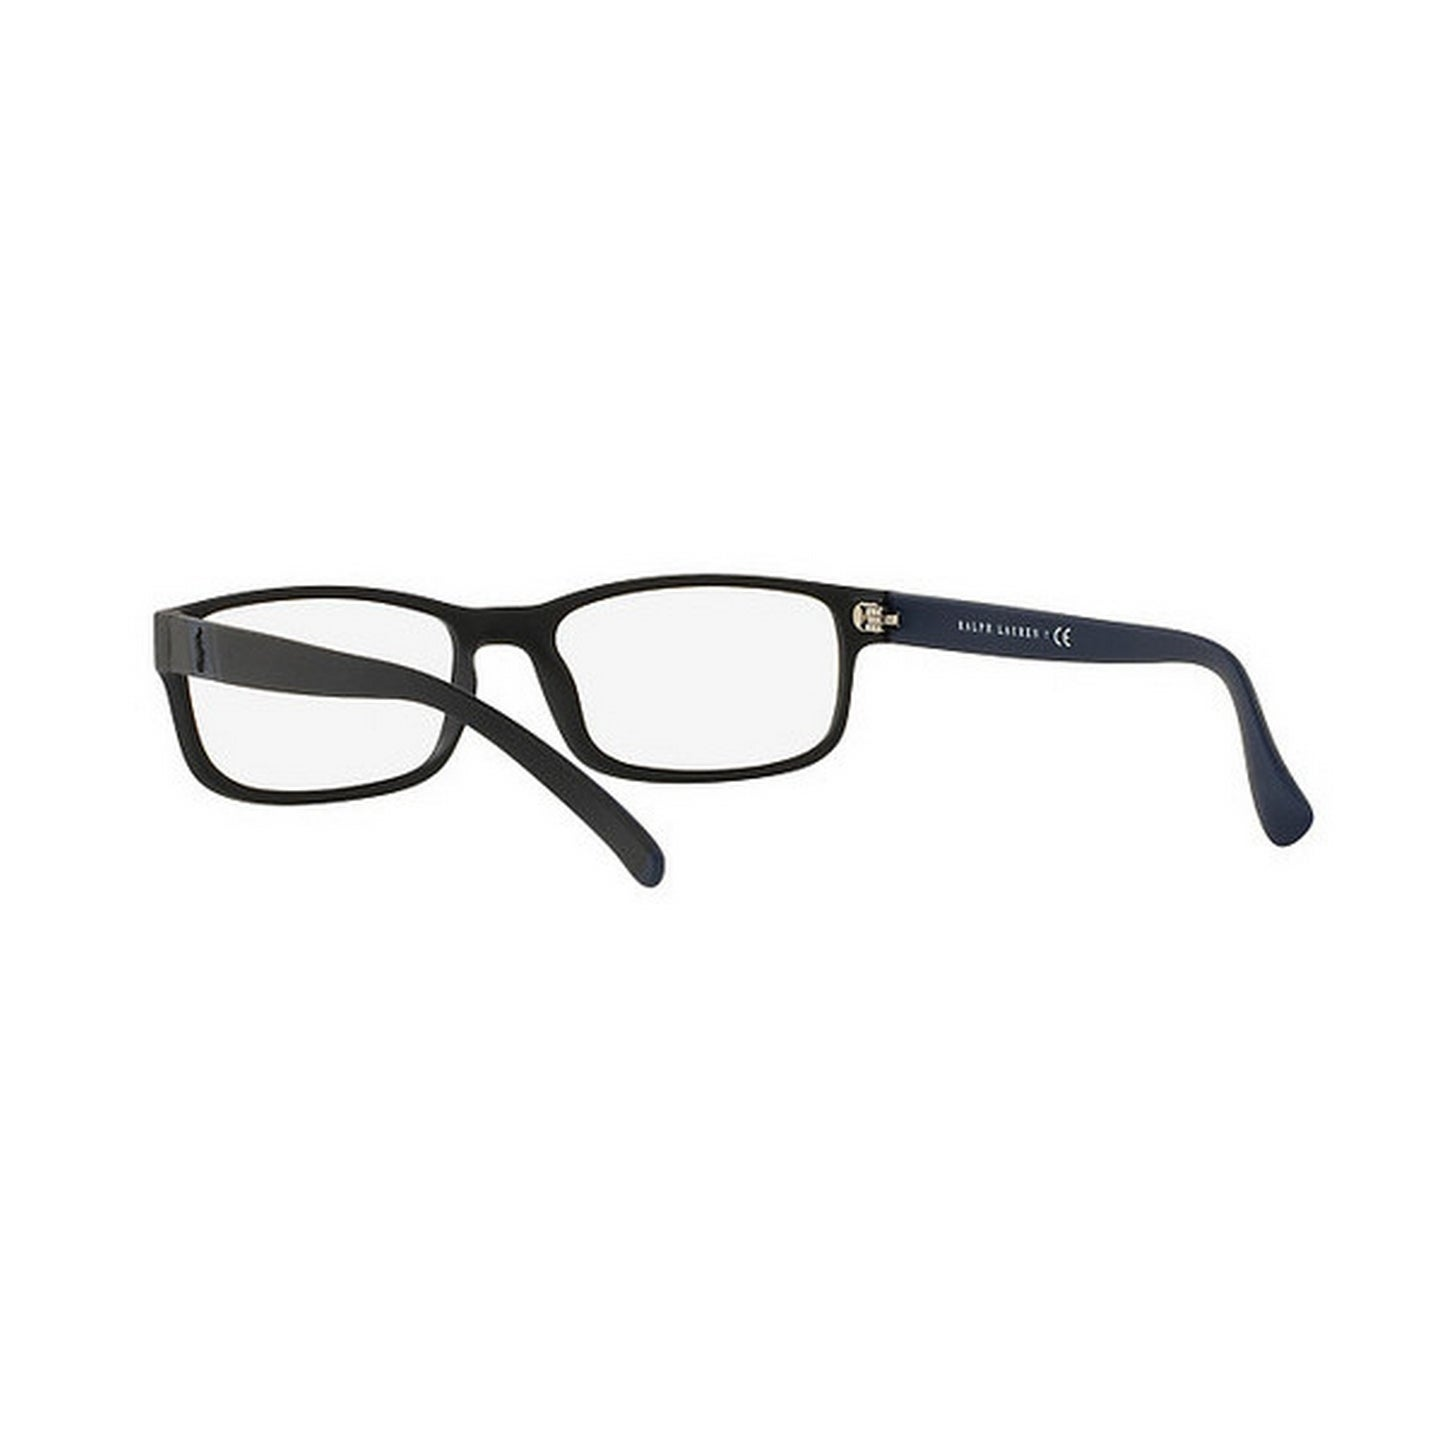 Men's Rectangle 56 Ralph Polo Black Ph2154 By Eyeglasses Plastic Lauren 5284 Clear Rjc5LqA43S